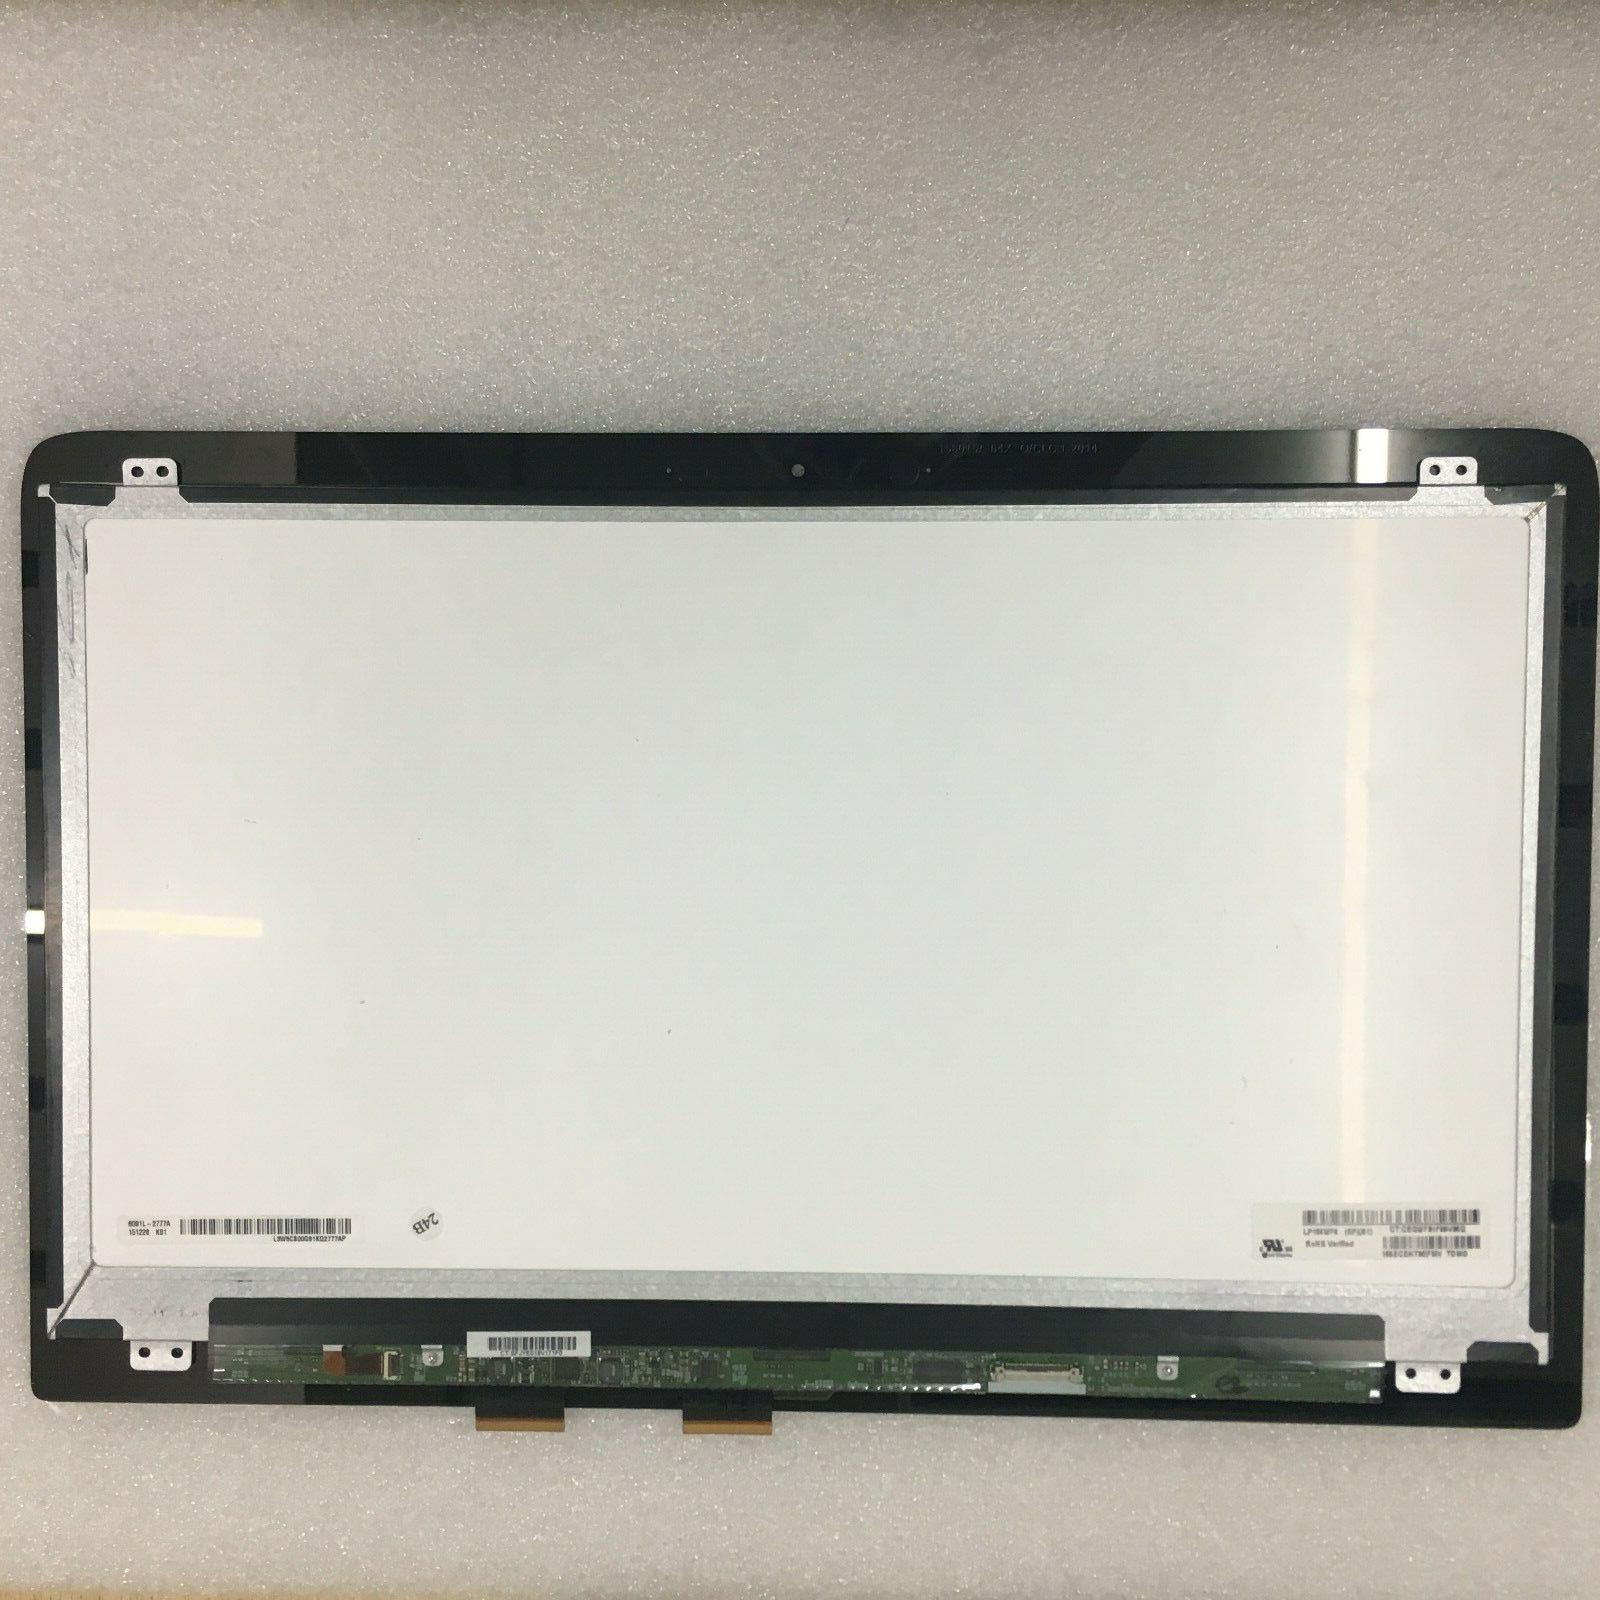 For HP Spectre X360 15-ap series 15-ap018ca 15-ap011dx 15-ap062nr 15-ap052nr Laptop LCD Display Touch Digitizer Screen Assembly